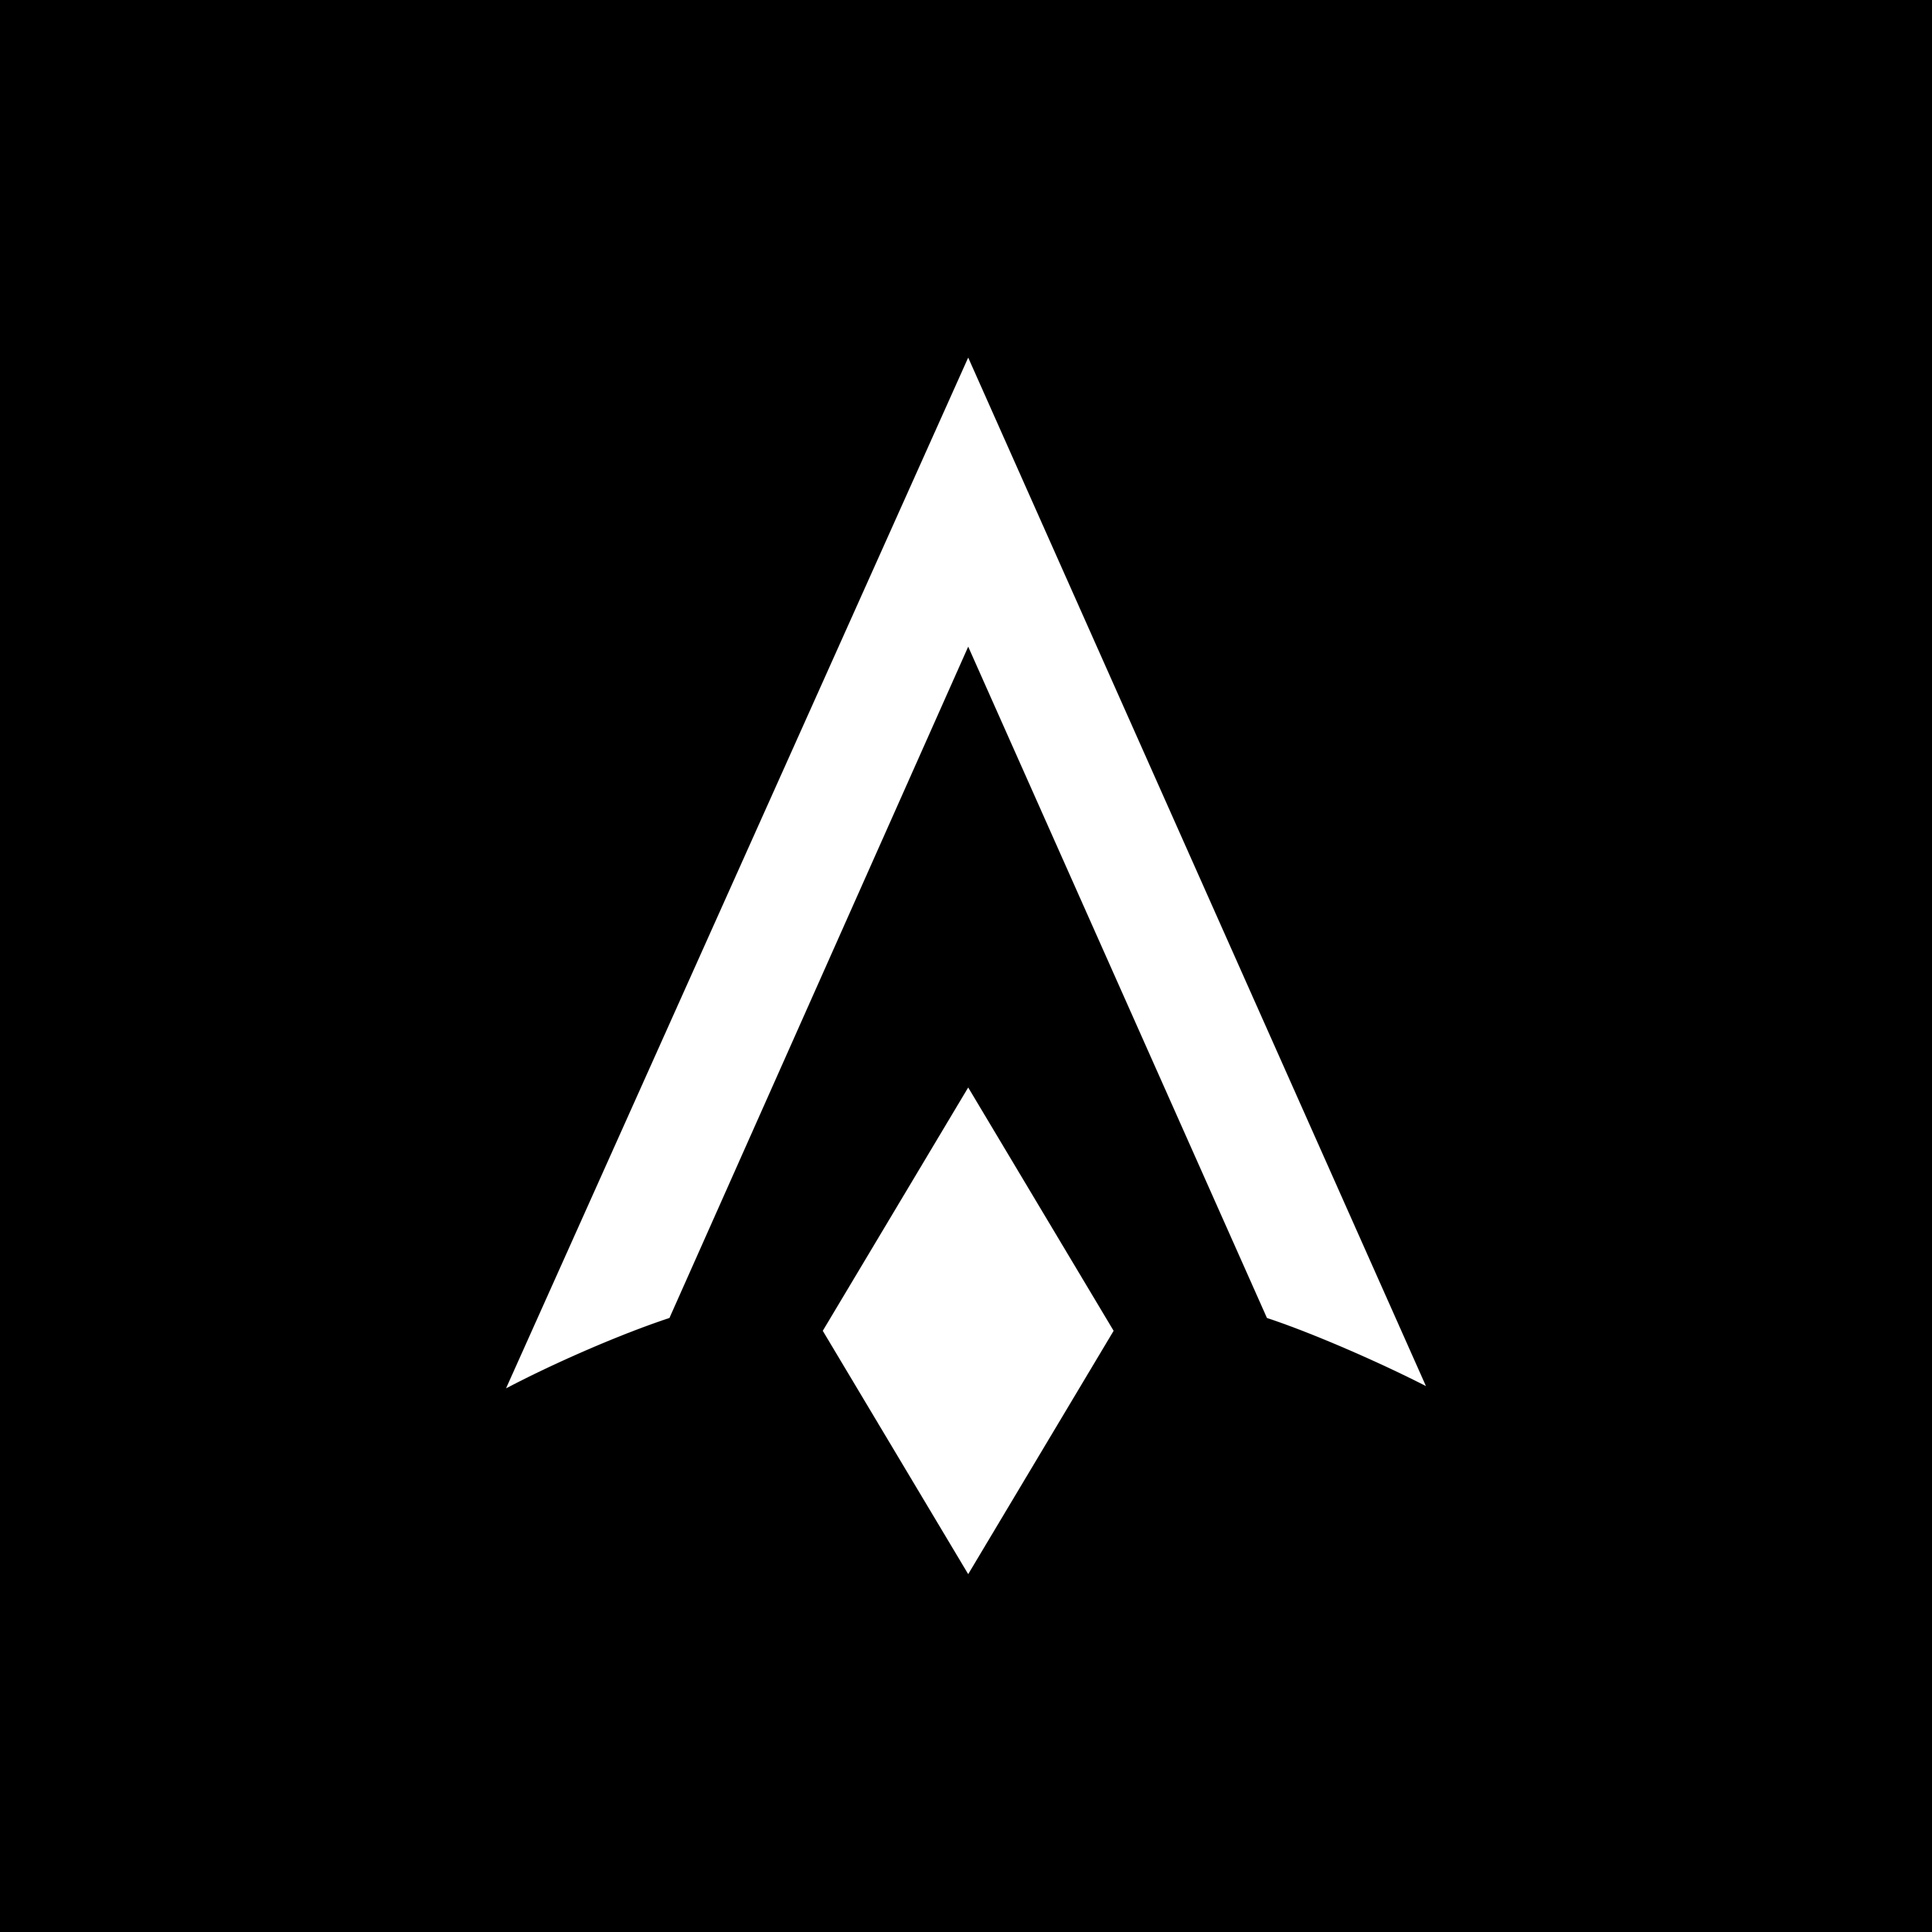 Launchers new logo. Image via Launcher.